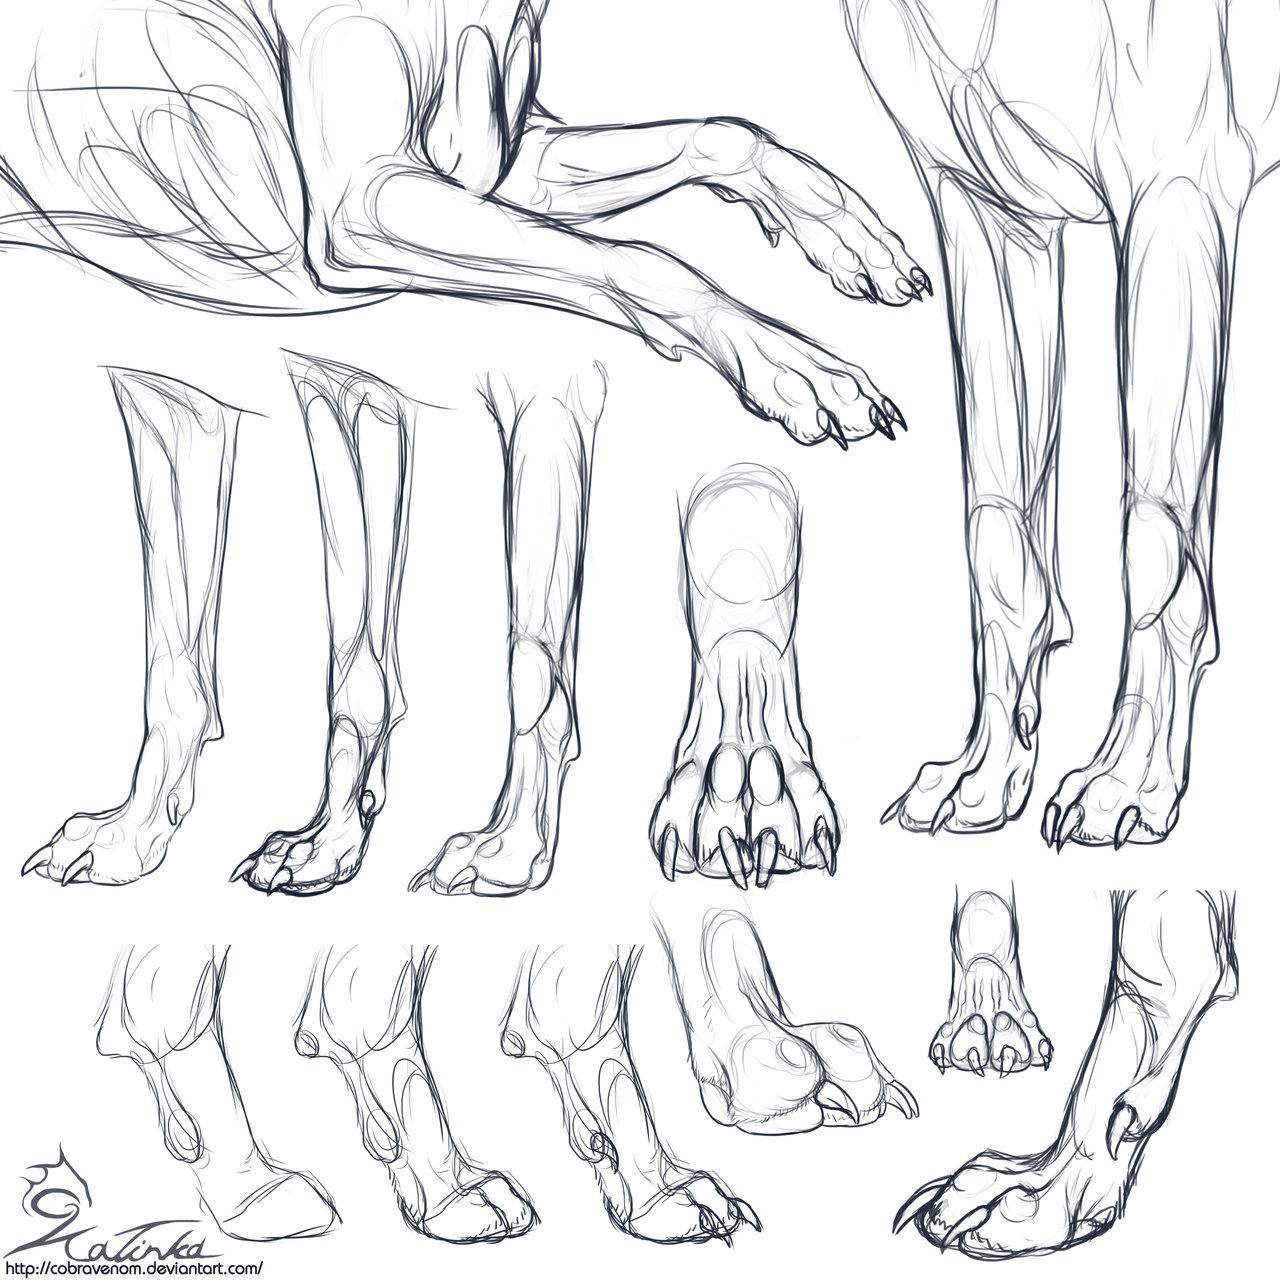 Leg Drawing at GetDrawings.com | Free for personal use Leg Drawing ...